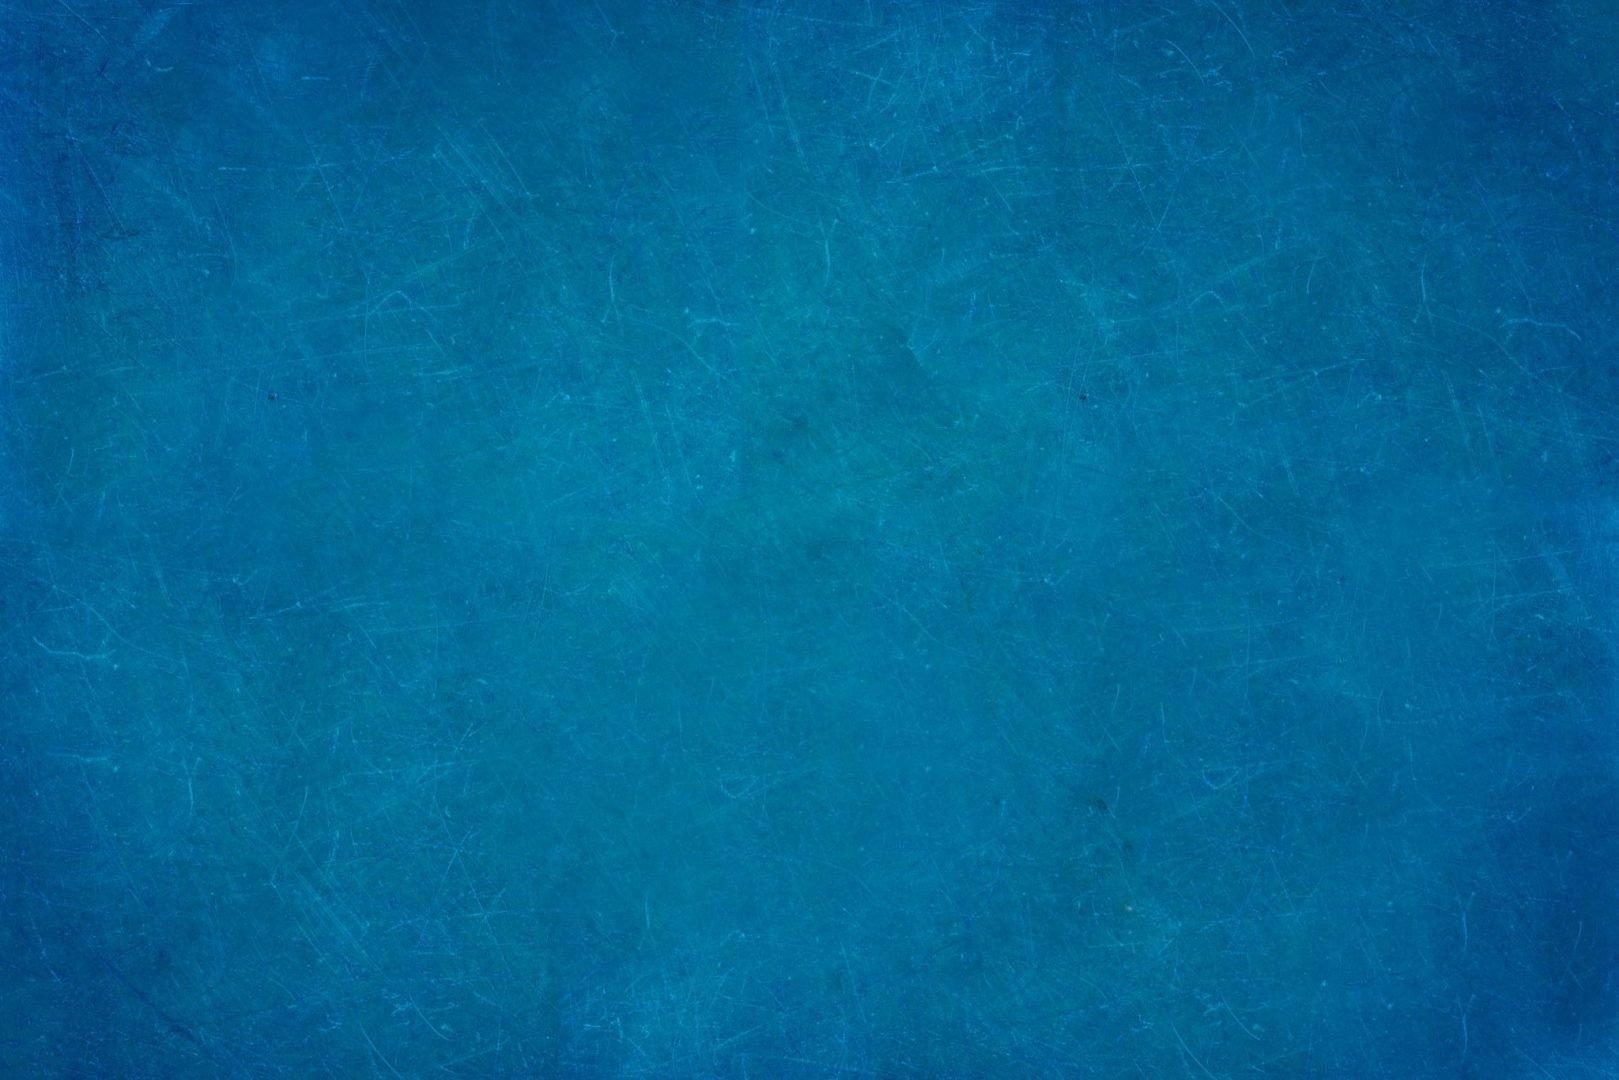 backgrounds-blank-blue-953214